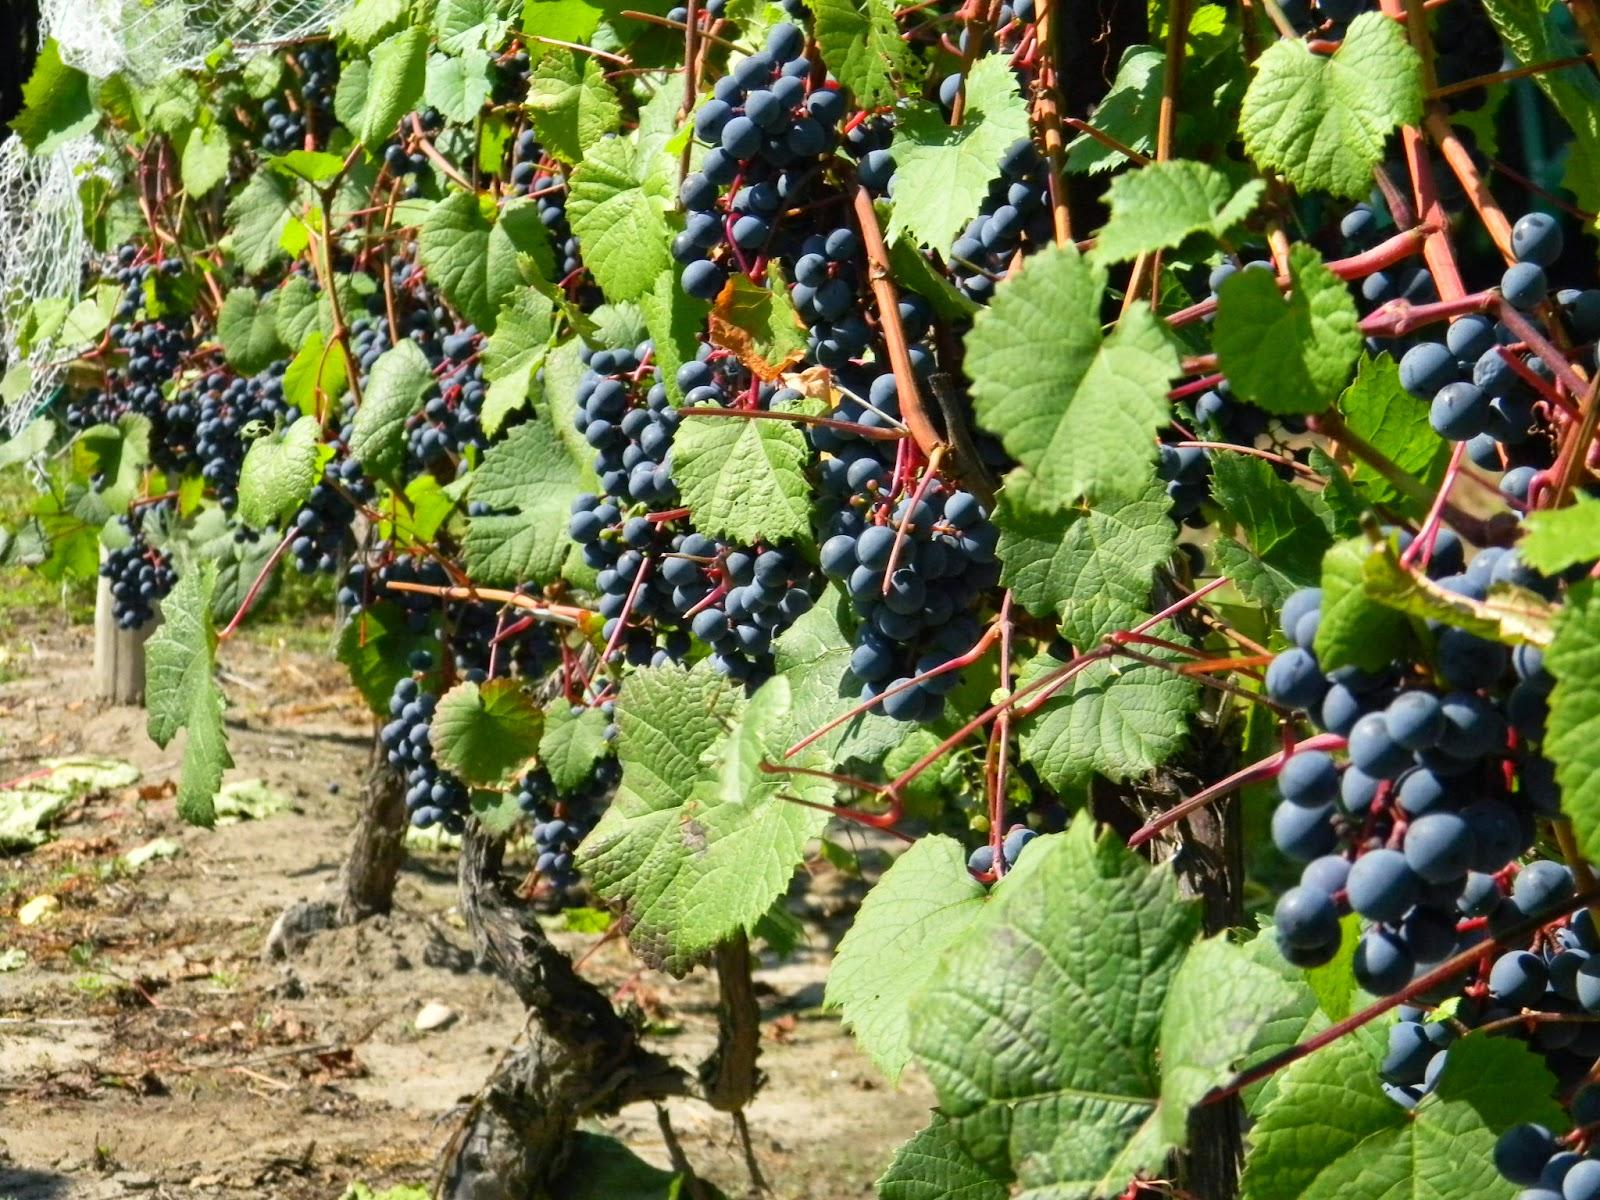 Cabernet_Severnyi-2012-harvest_Carone.JPG